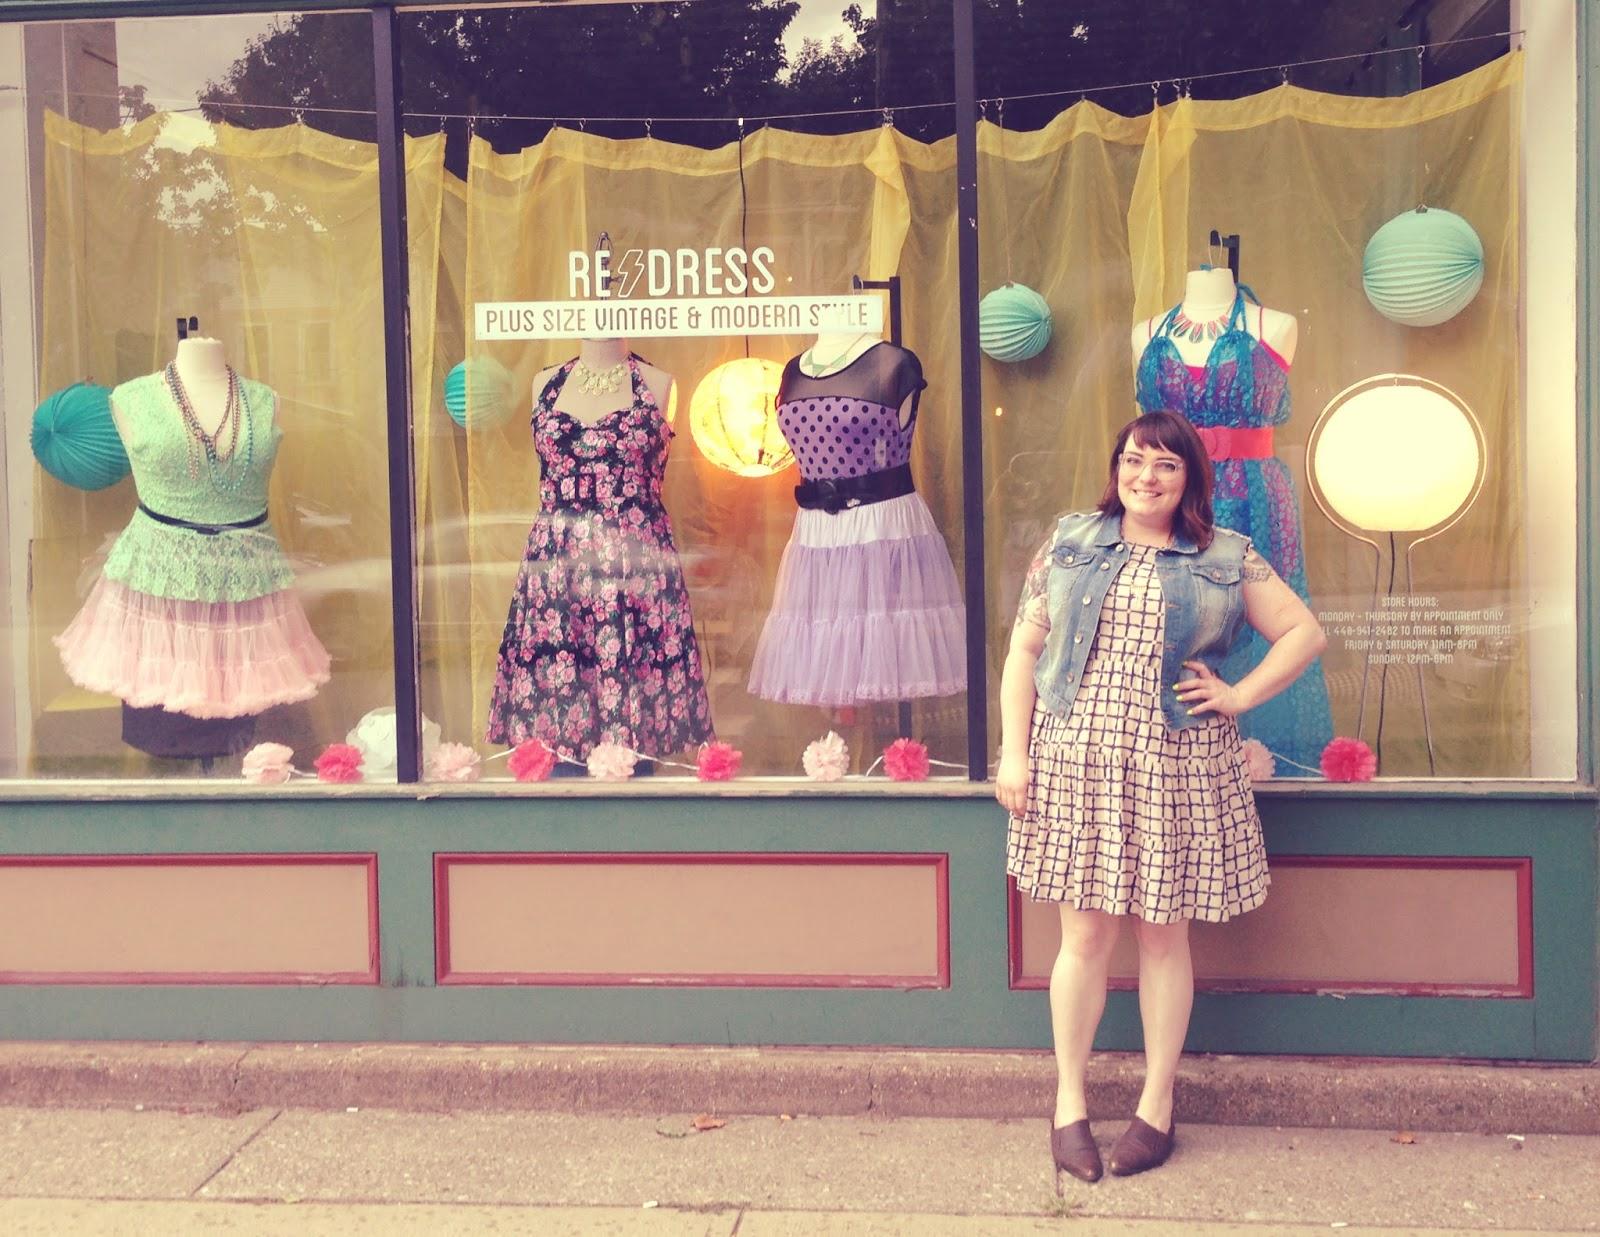 Re/Dress